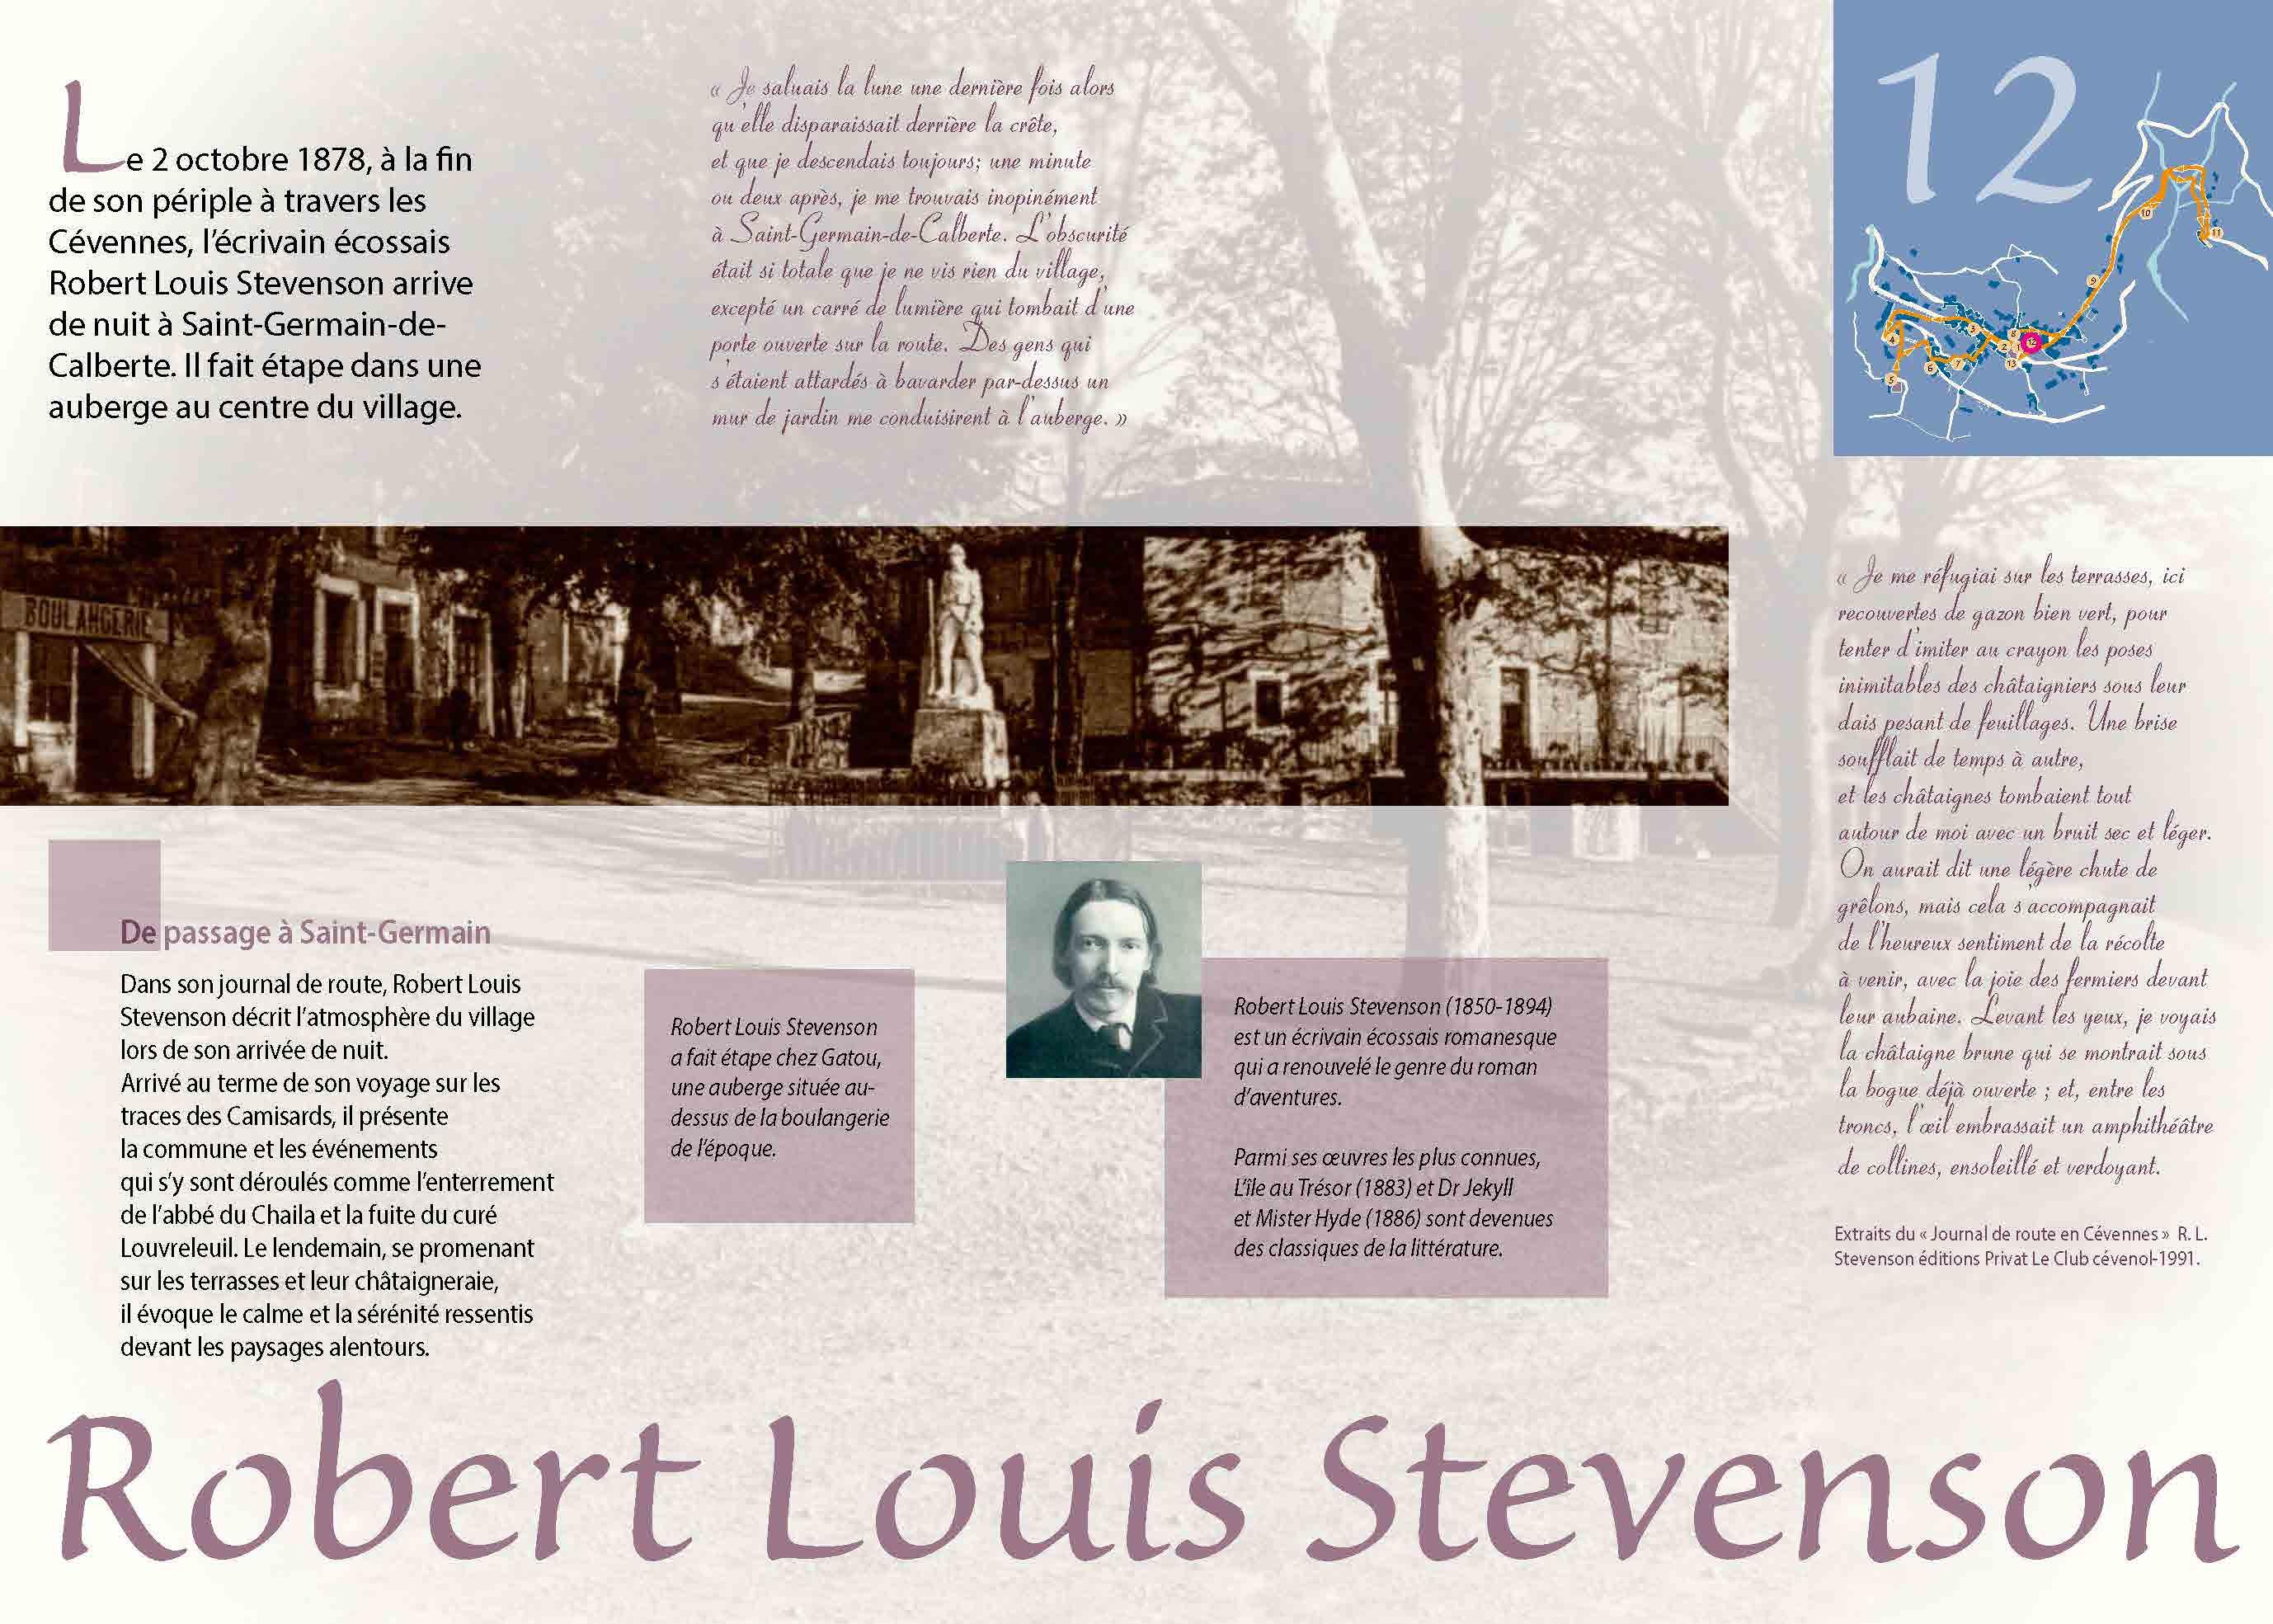 Robert Louis Stevenson à Saint-Germain-de-Calberte